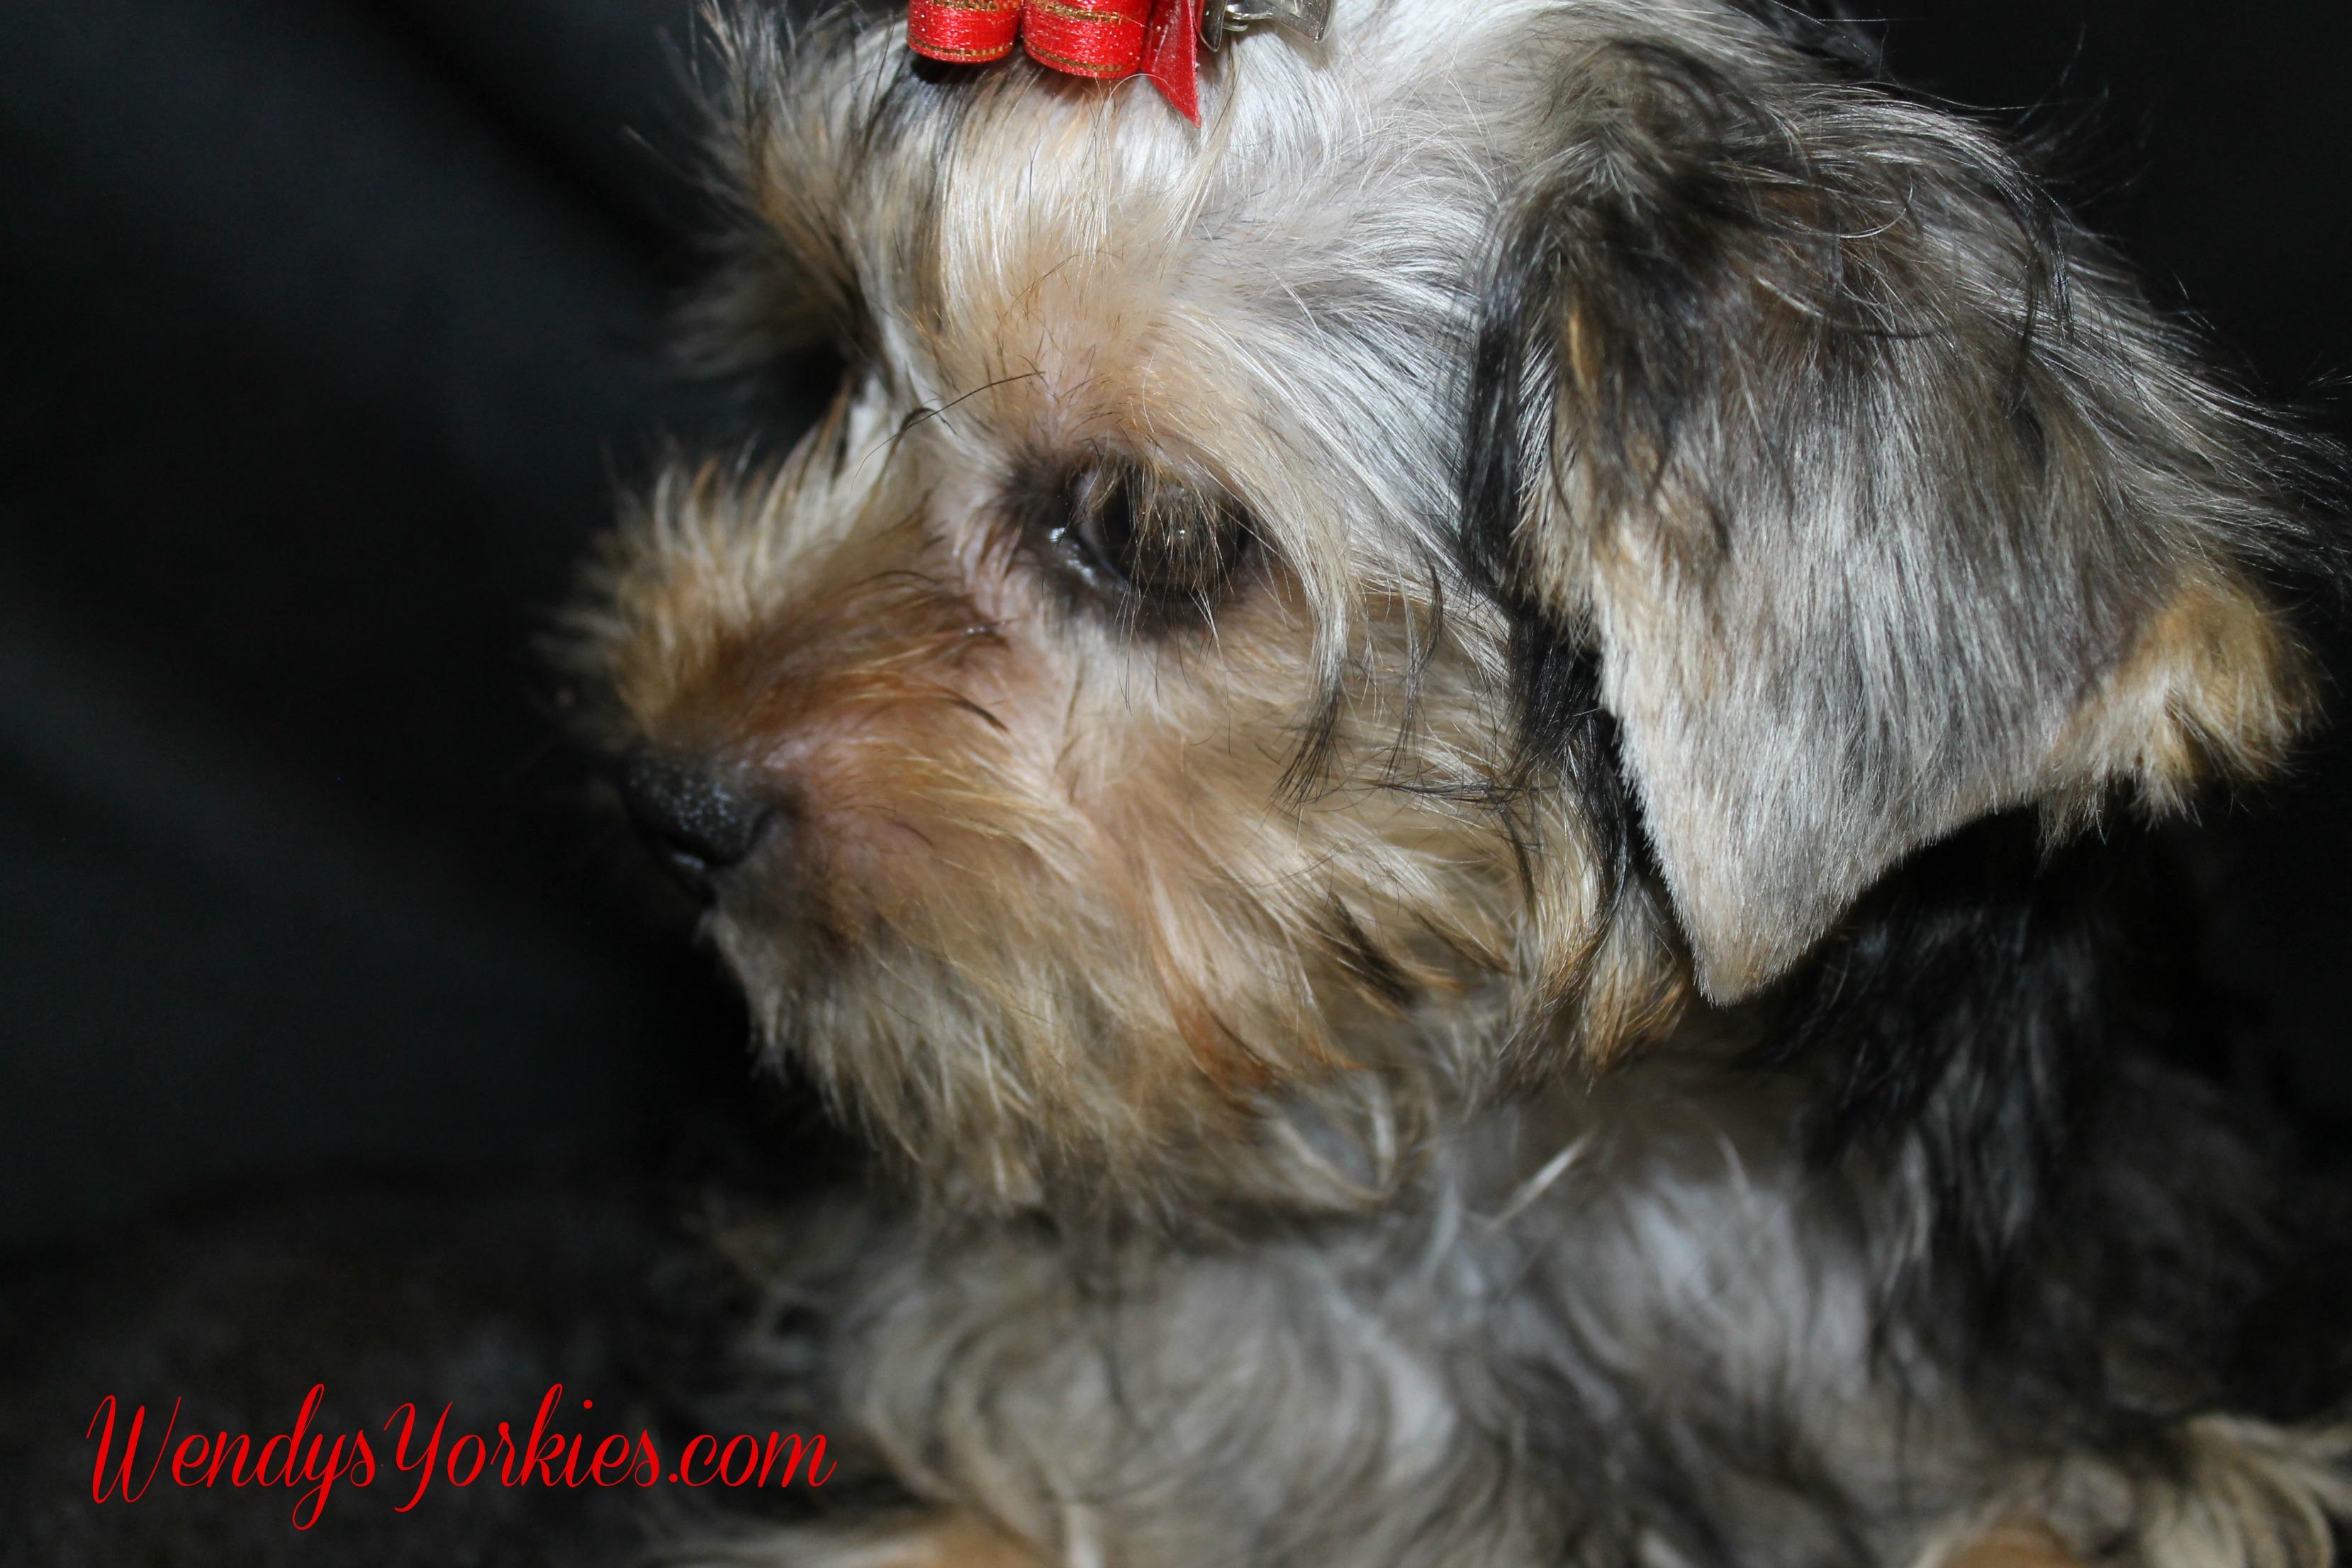 Sweet Yorkie puppy, WendysYorkies.com, PhoebeDixon